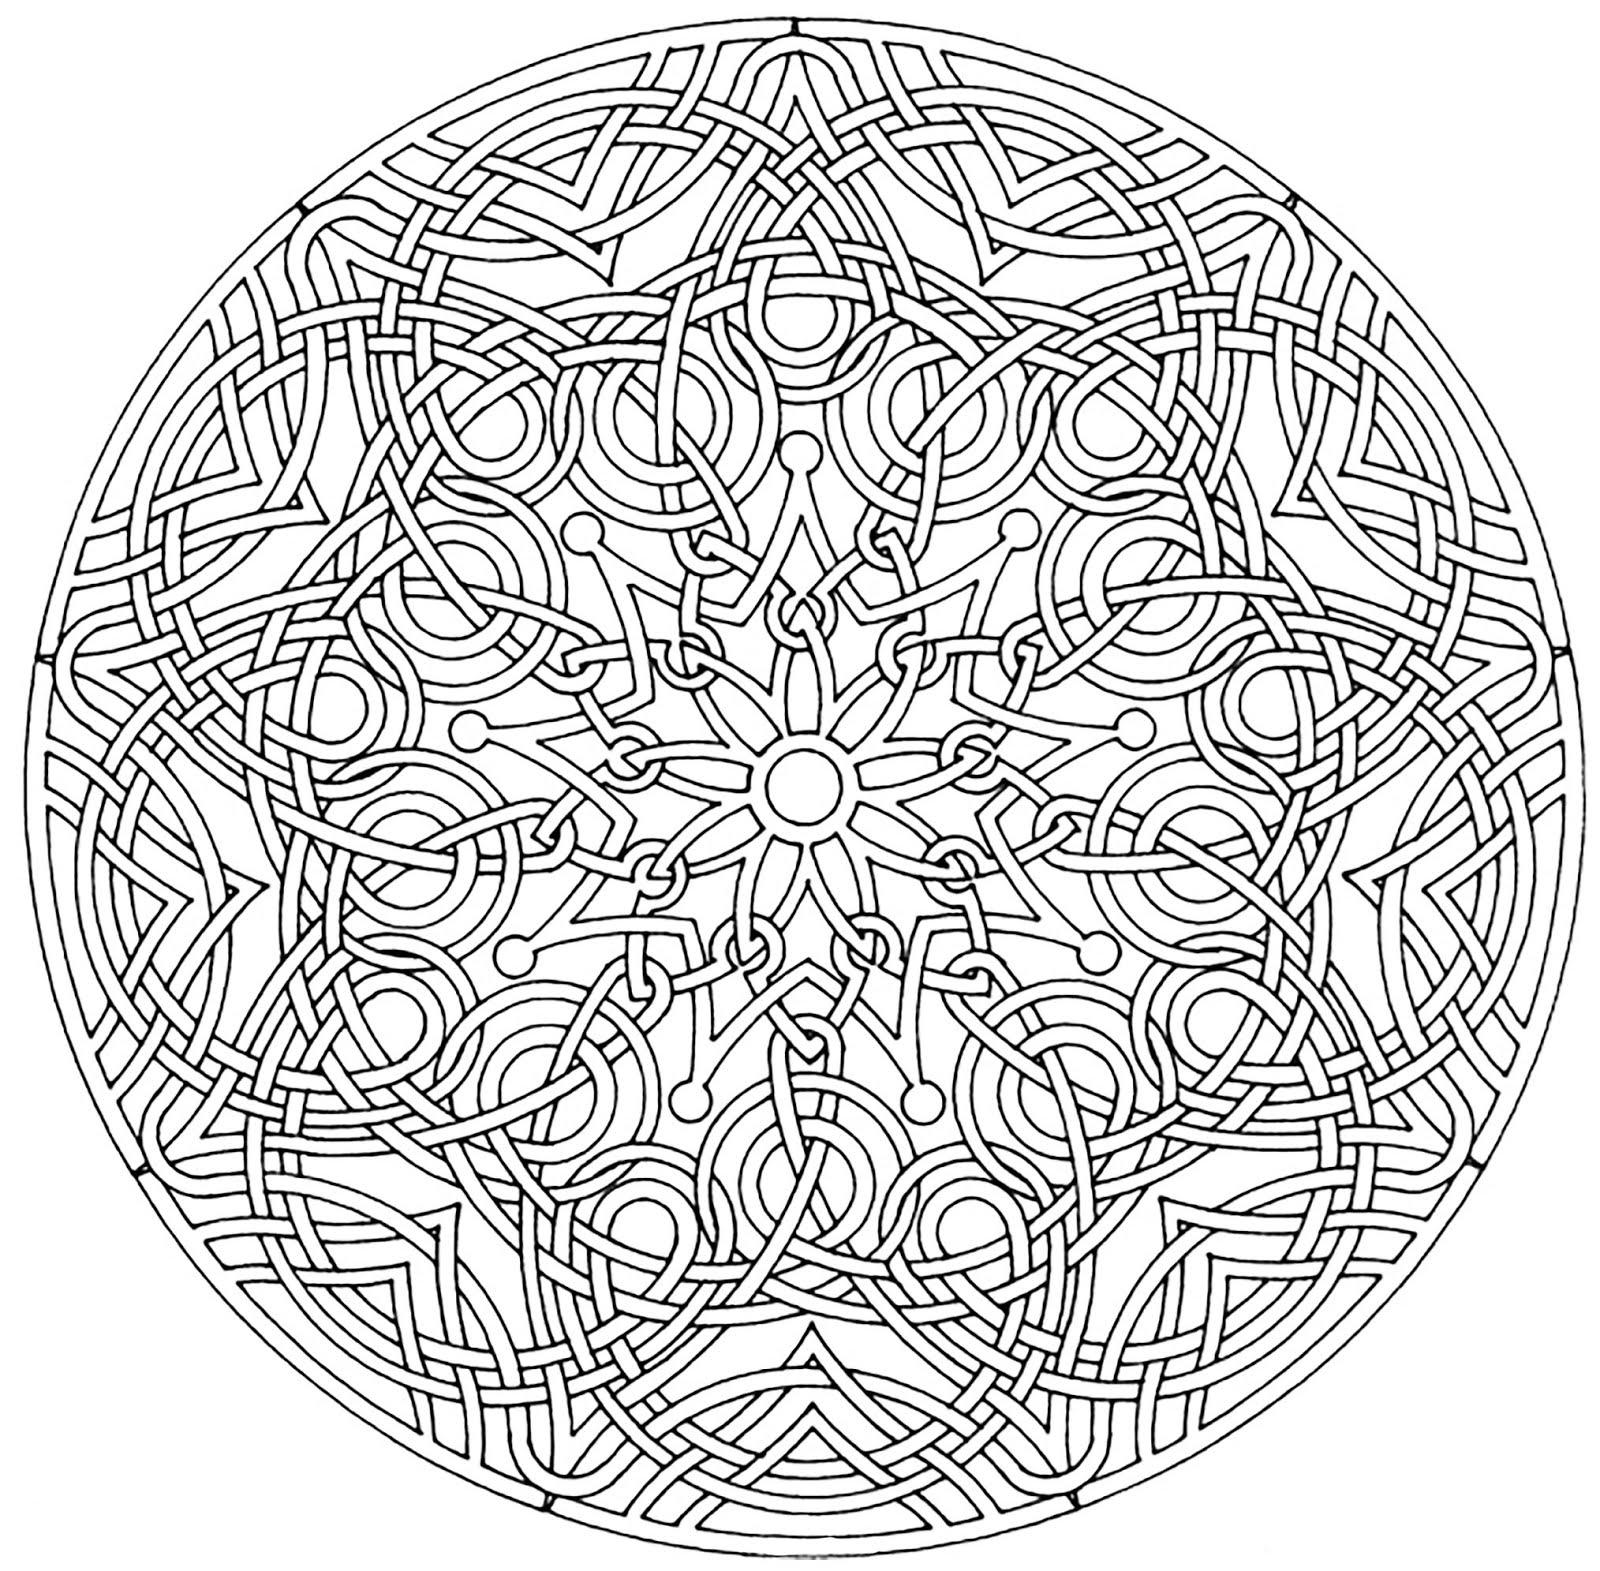 Saya pribadi sih belum nyobain mewarnai pola mandala ini Selama ini saya lebih tertarik ke objek objek yang dekat di kehidupan sehari hari seperti